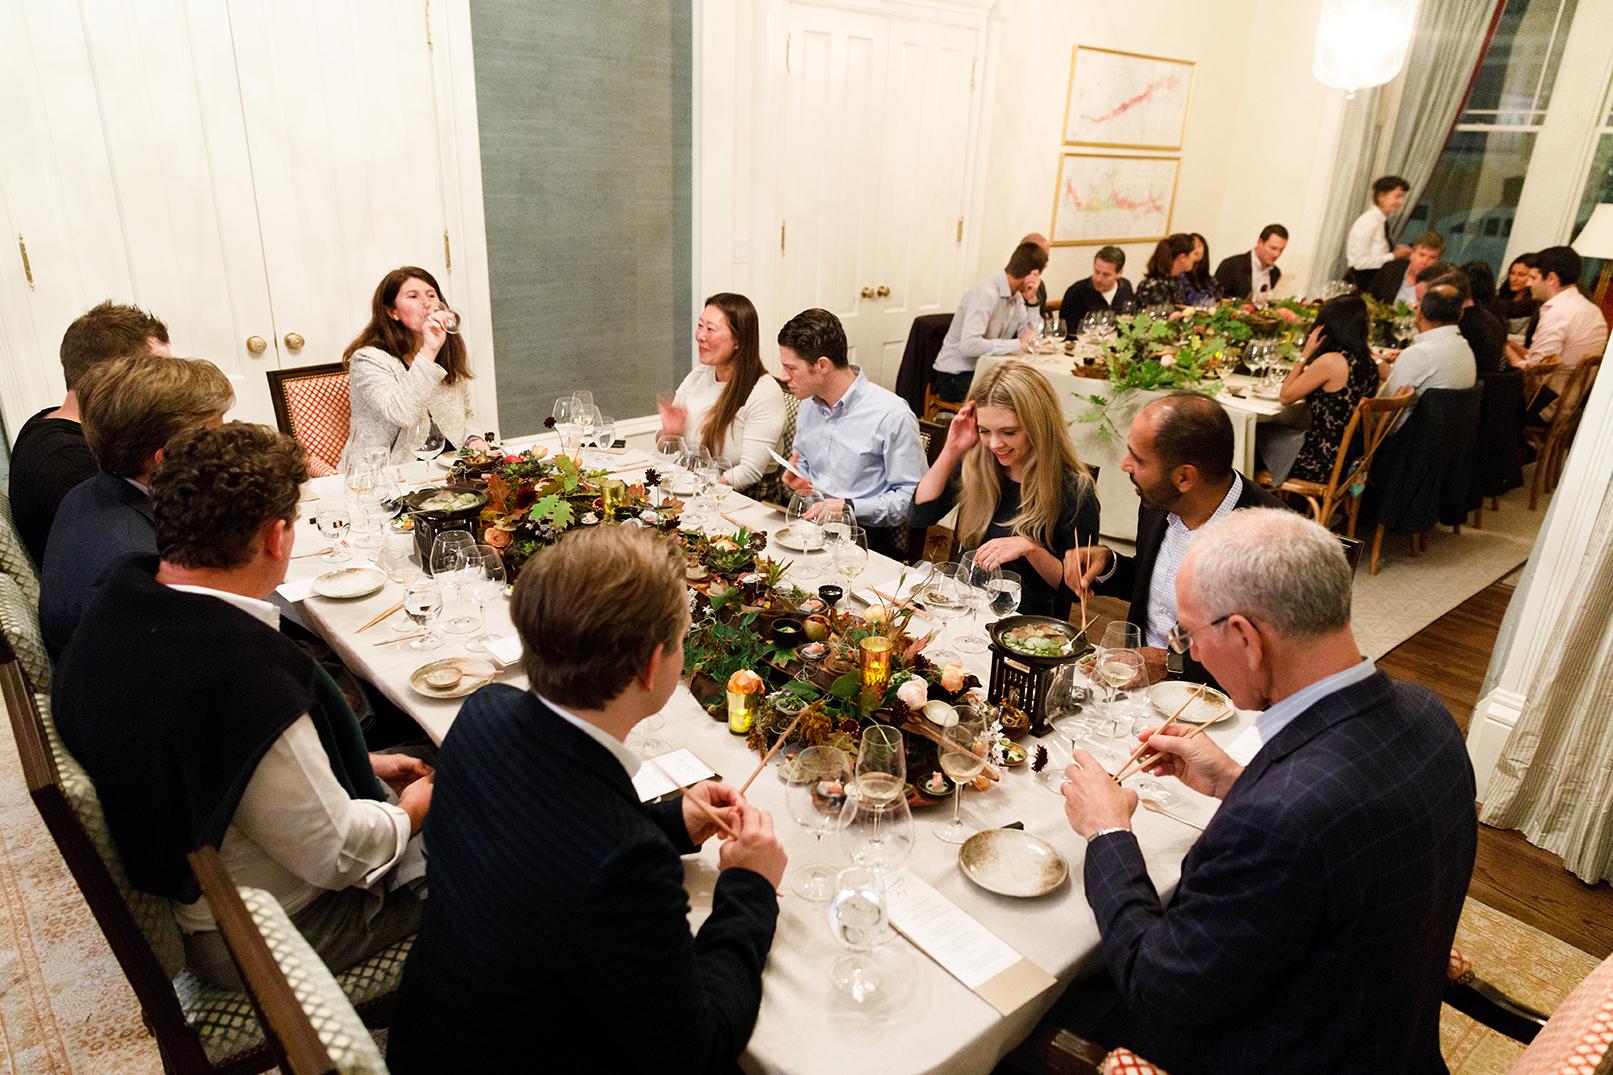 Guests at The Art of Plating x SingleThread x Olivier Bernstein Dinner © Nader Khouri